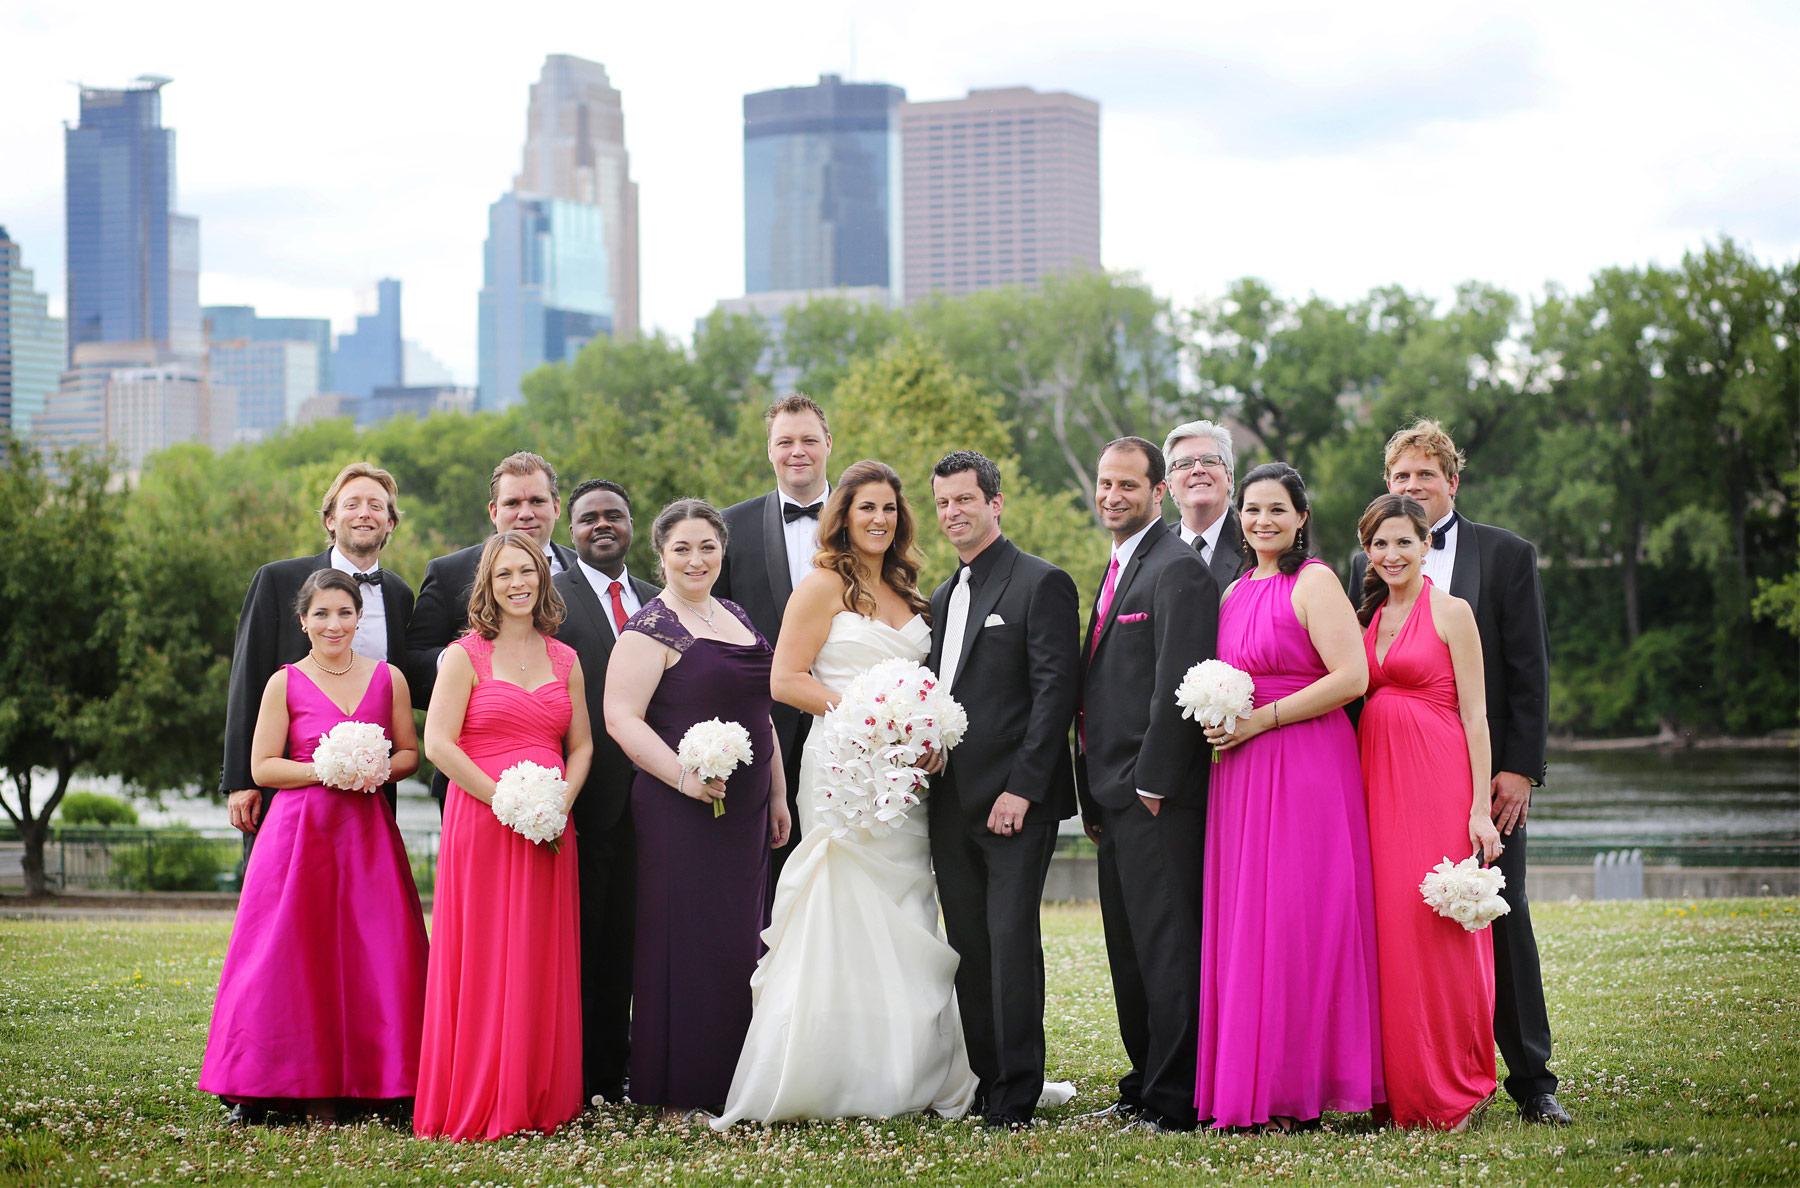 06-Minneapolis-Minnesota-Wedding-Photography-by-Vick-Photography-Aria-Downtown-Wedding-Party-Layne-&-Dan.jpg